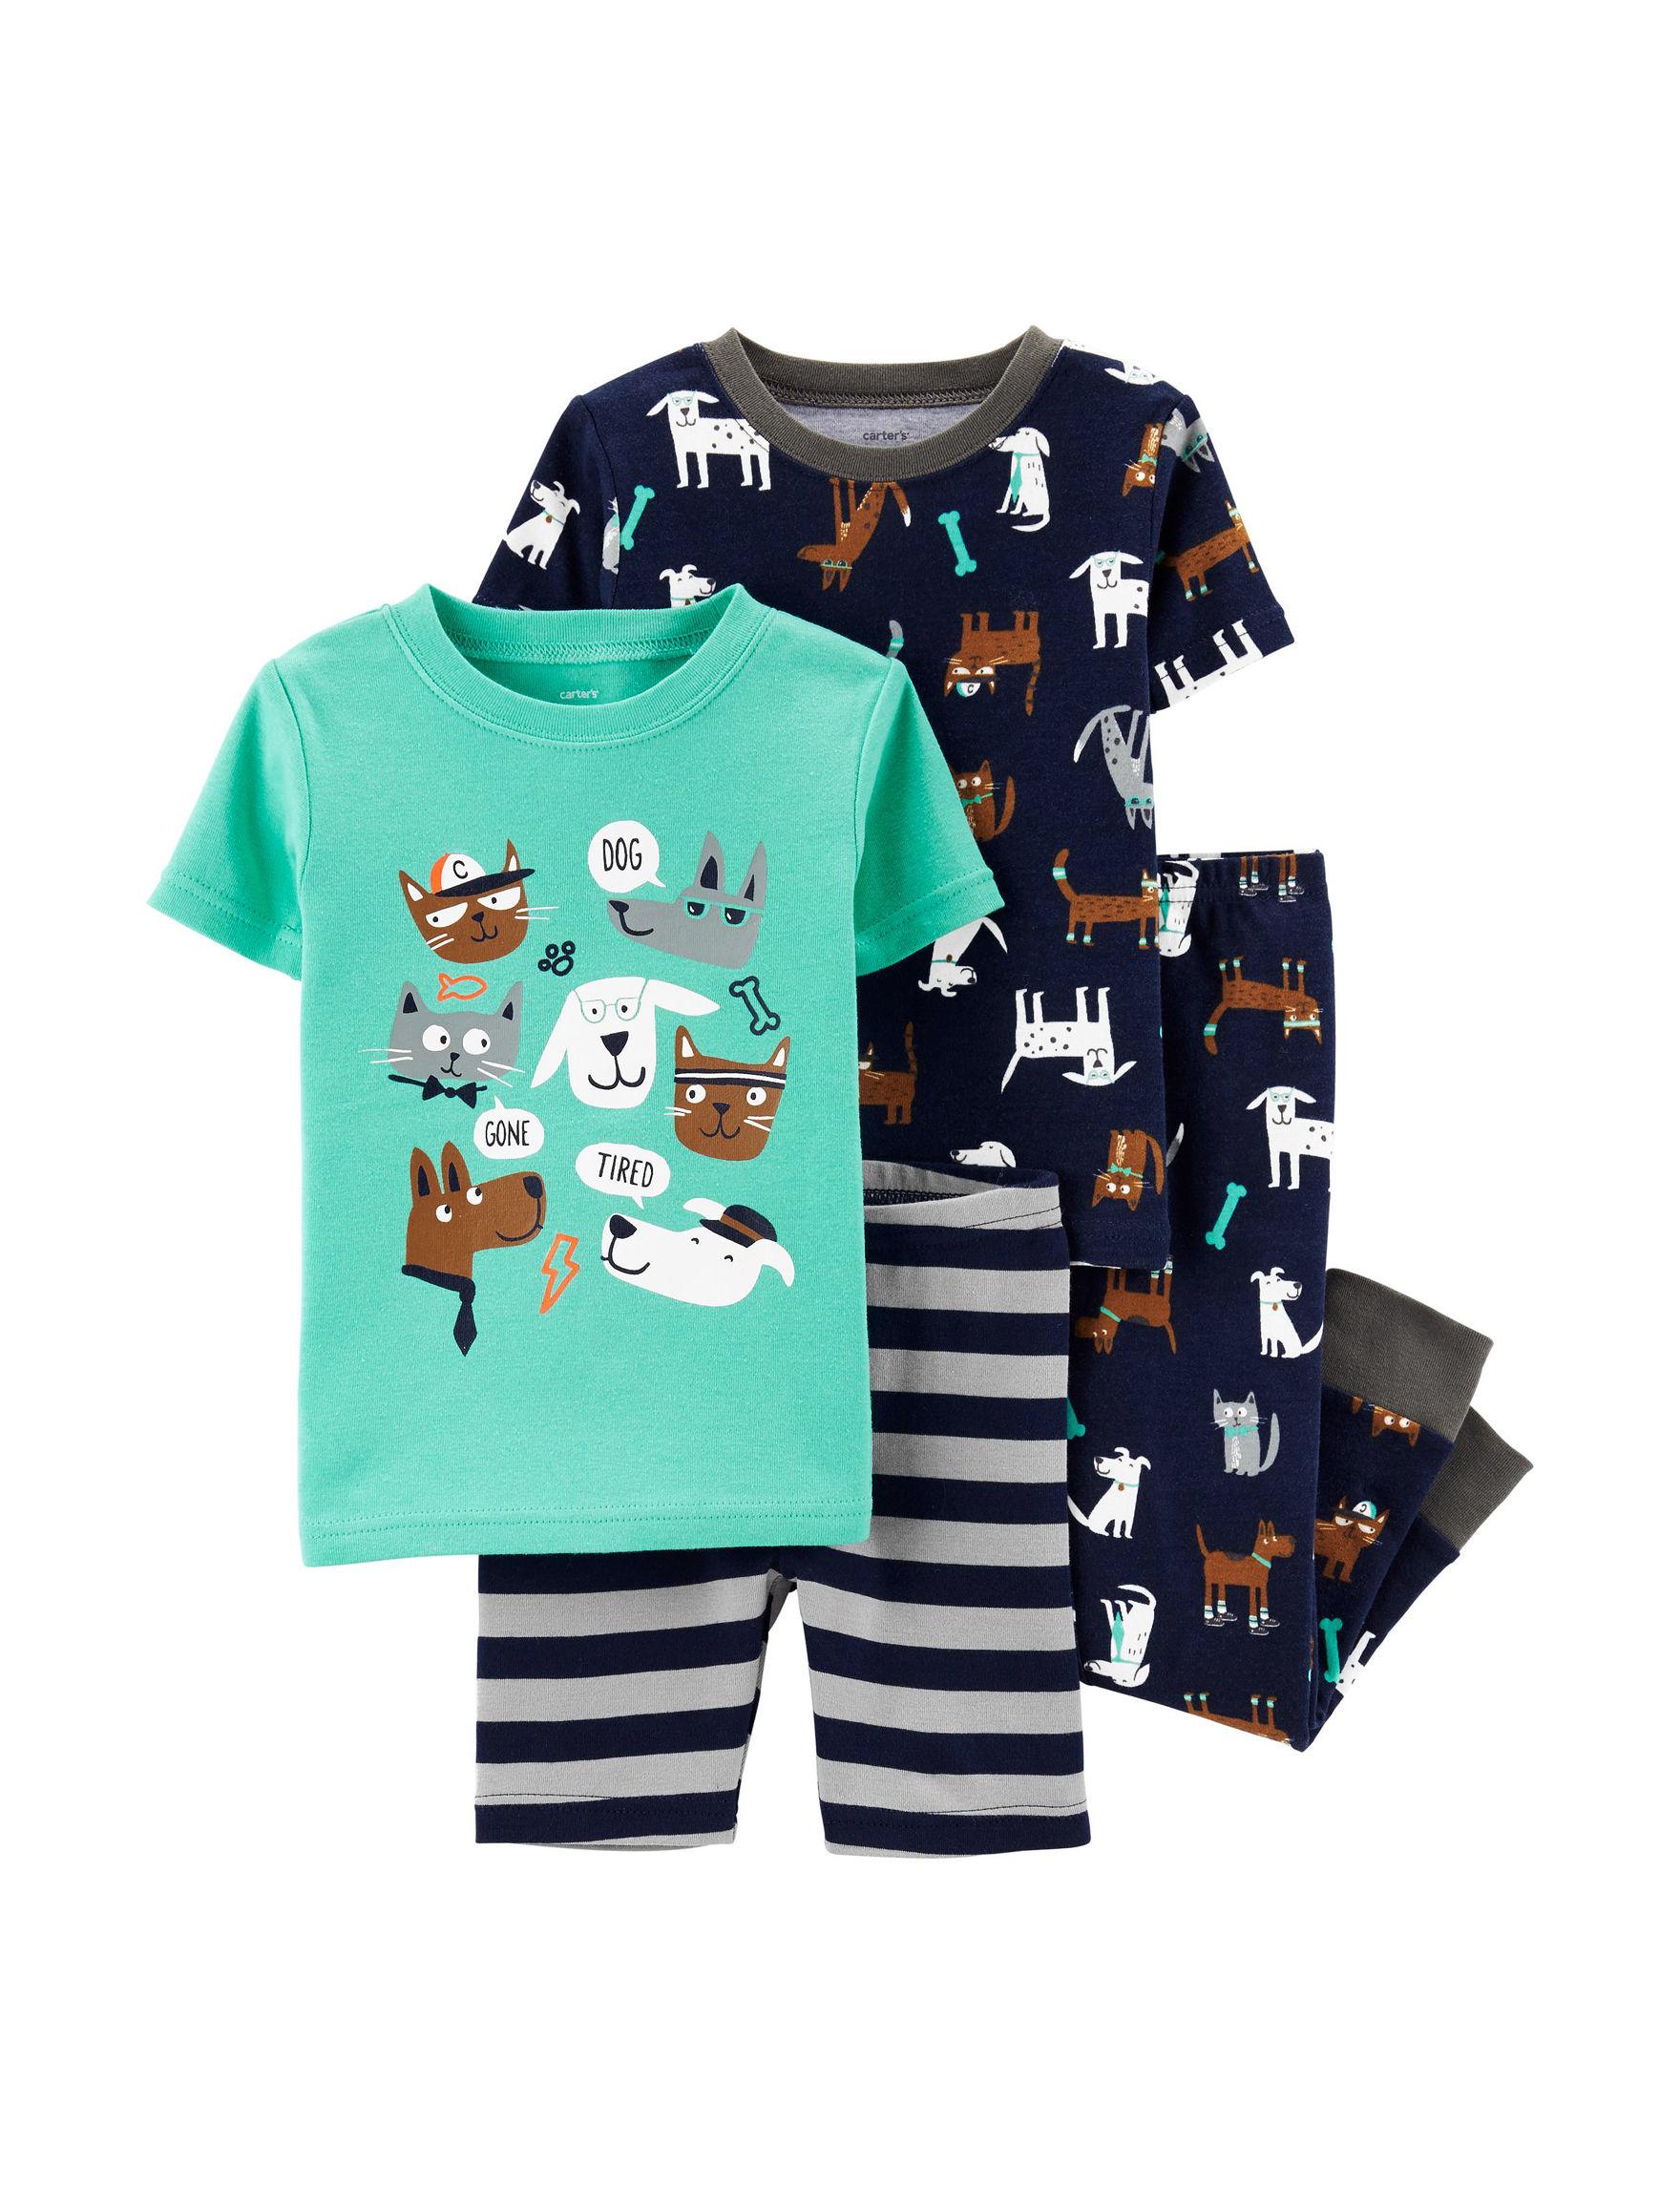 Carter's Aqua / Navy Pajama Sets